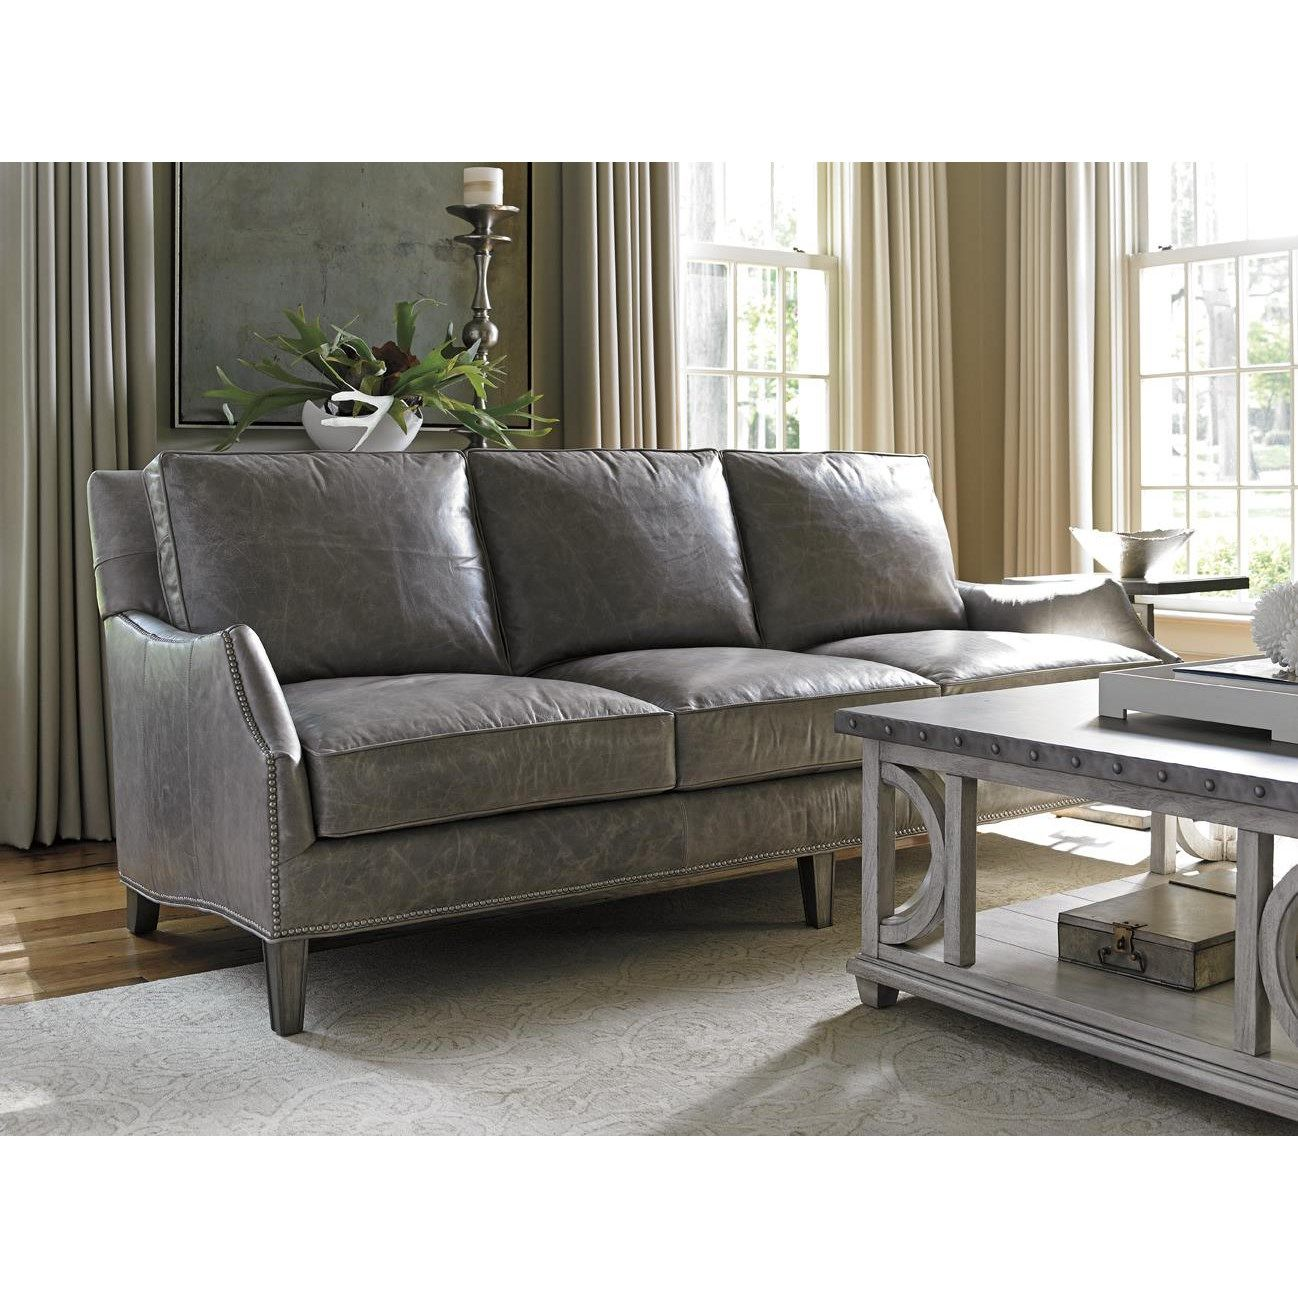 Lexington Furniture 01 7118 33 02 Ashton Leather Sofa